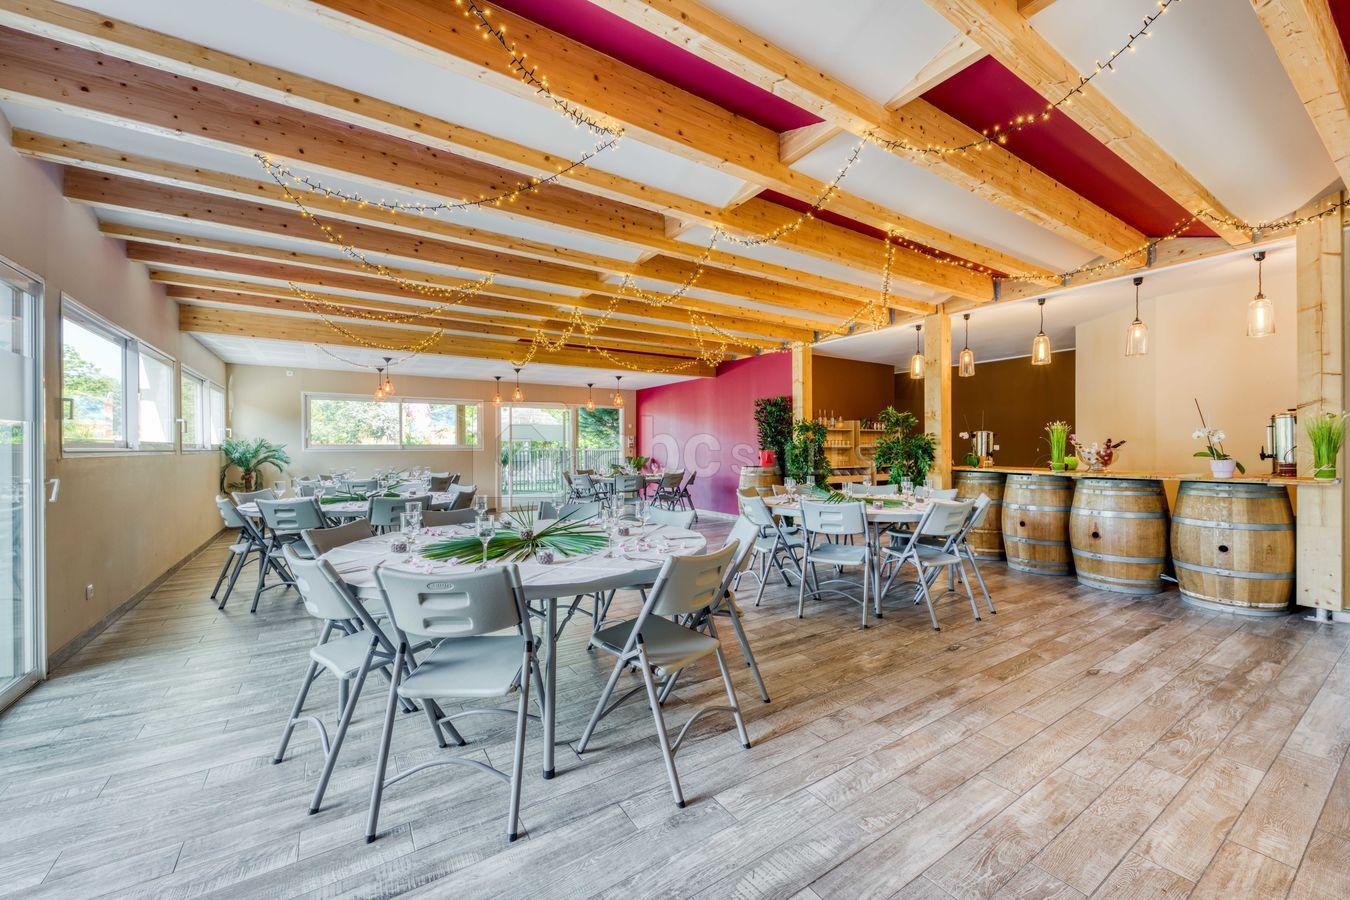 Mariage en Gironde : où recevoir les invités ?